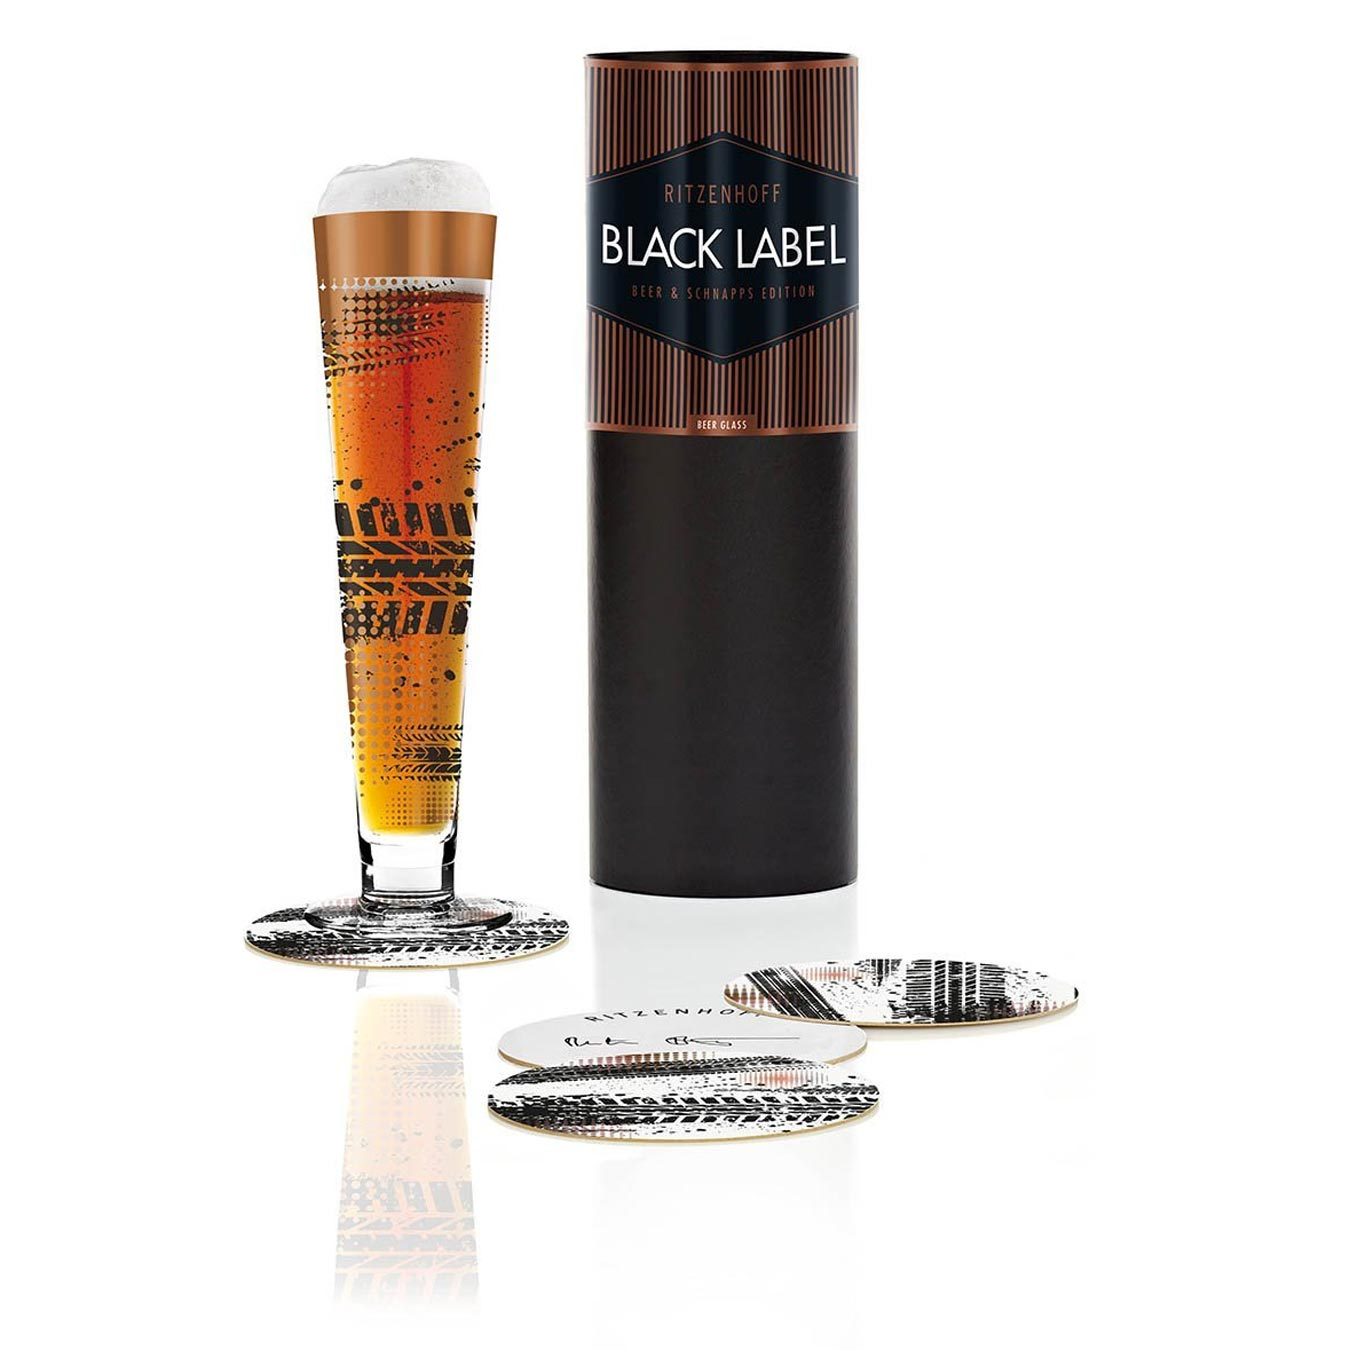 Ritzenhoff bier glas 19,95€